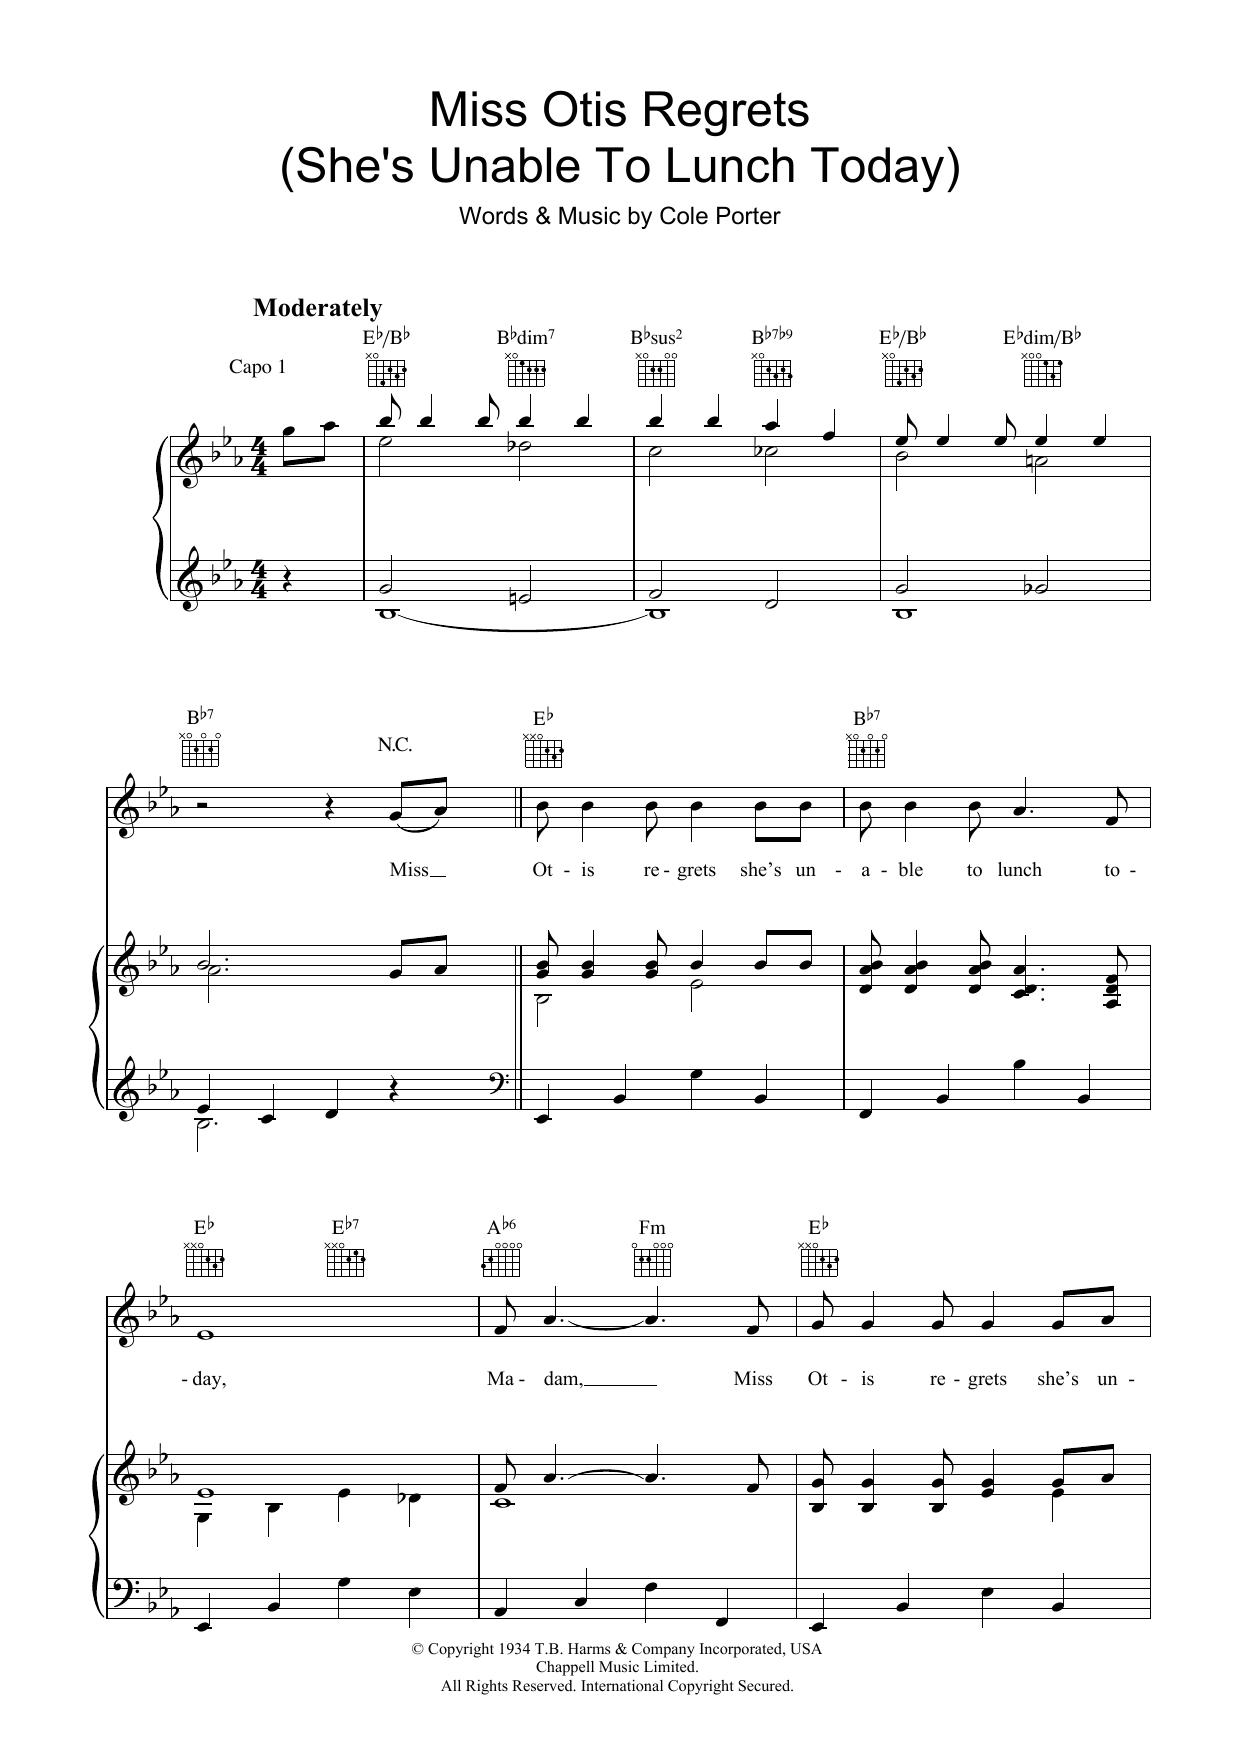 Miss Otis Regrets (Piano, Vocal & Guitar)